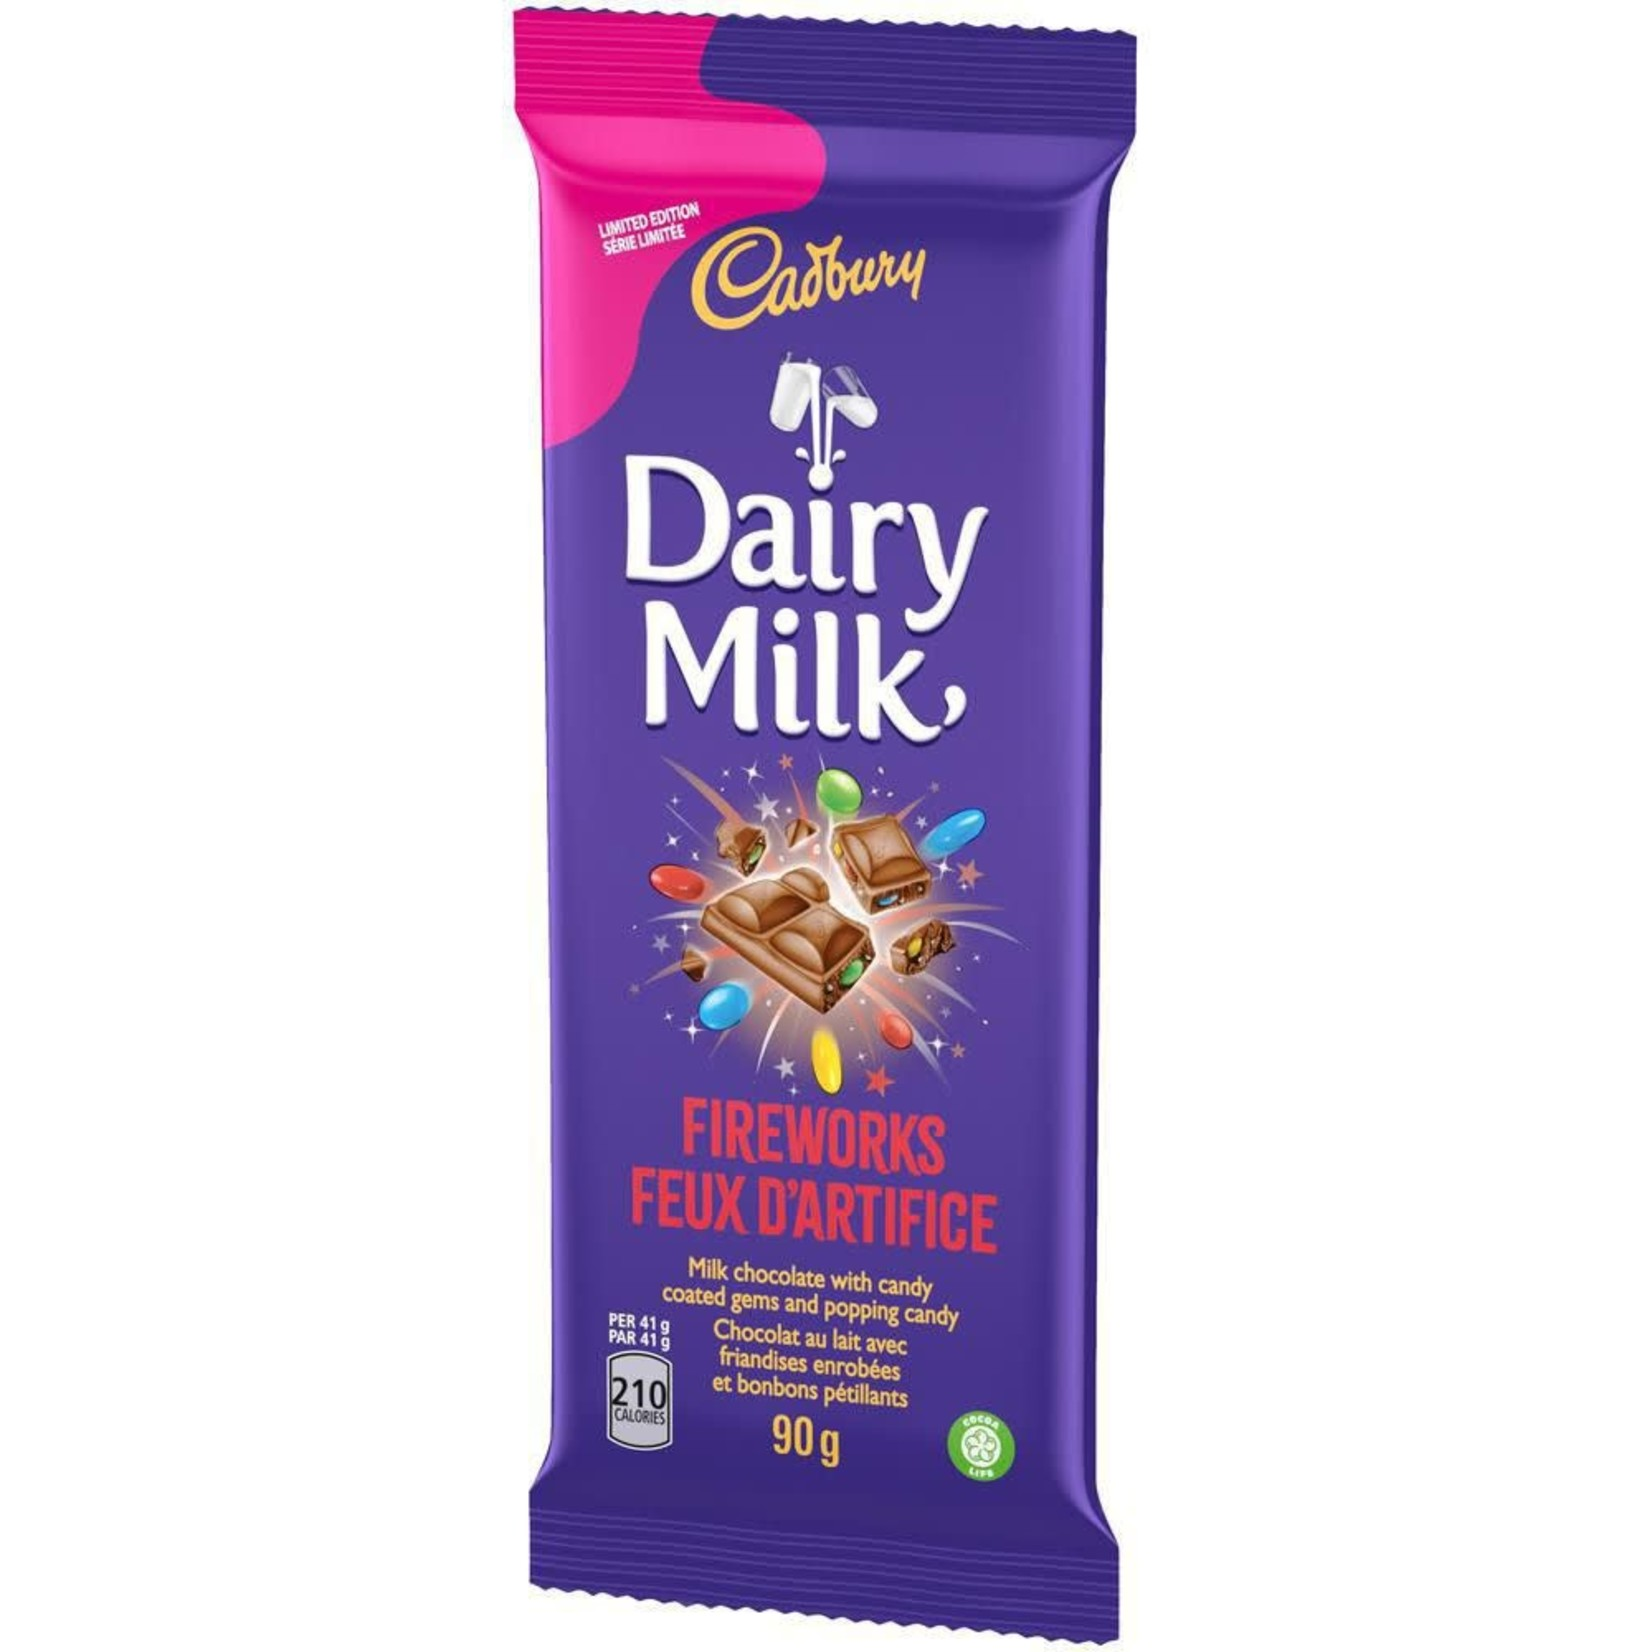 Cadbury Dairy Milk Fireworks